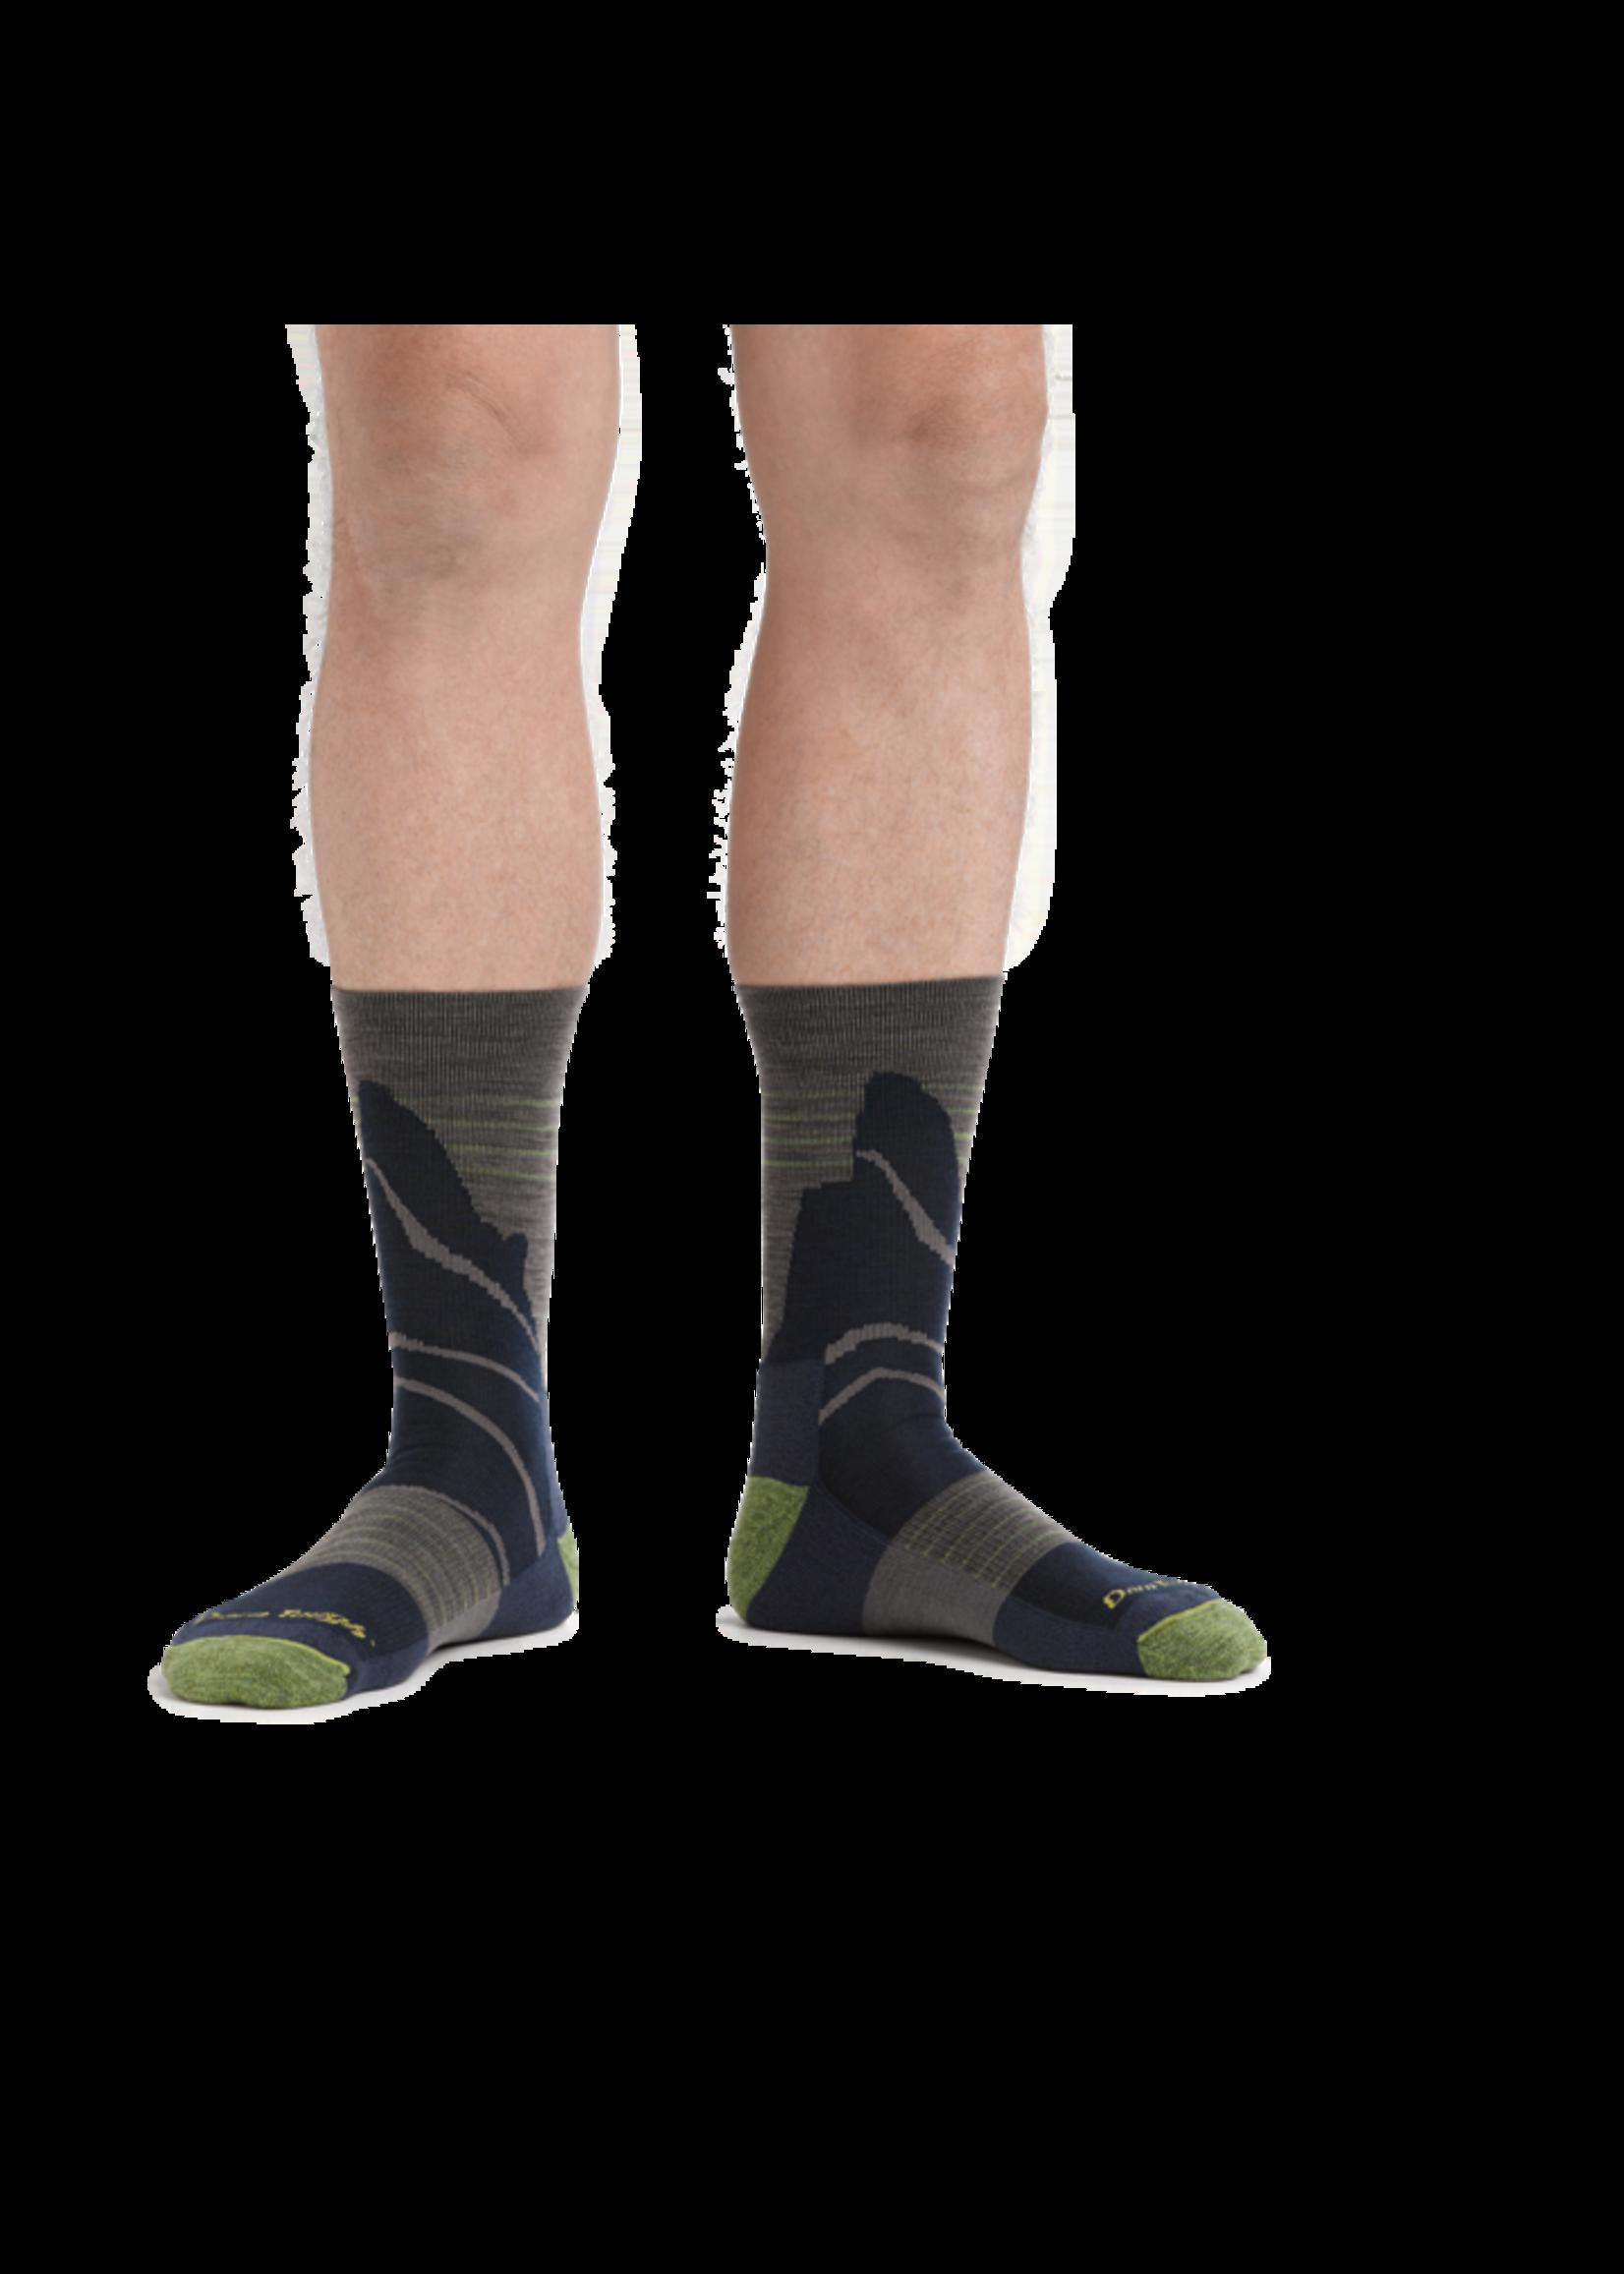 Darn Tough Men's Pinnacle Miro Crew Lightweight Hike Sock